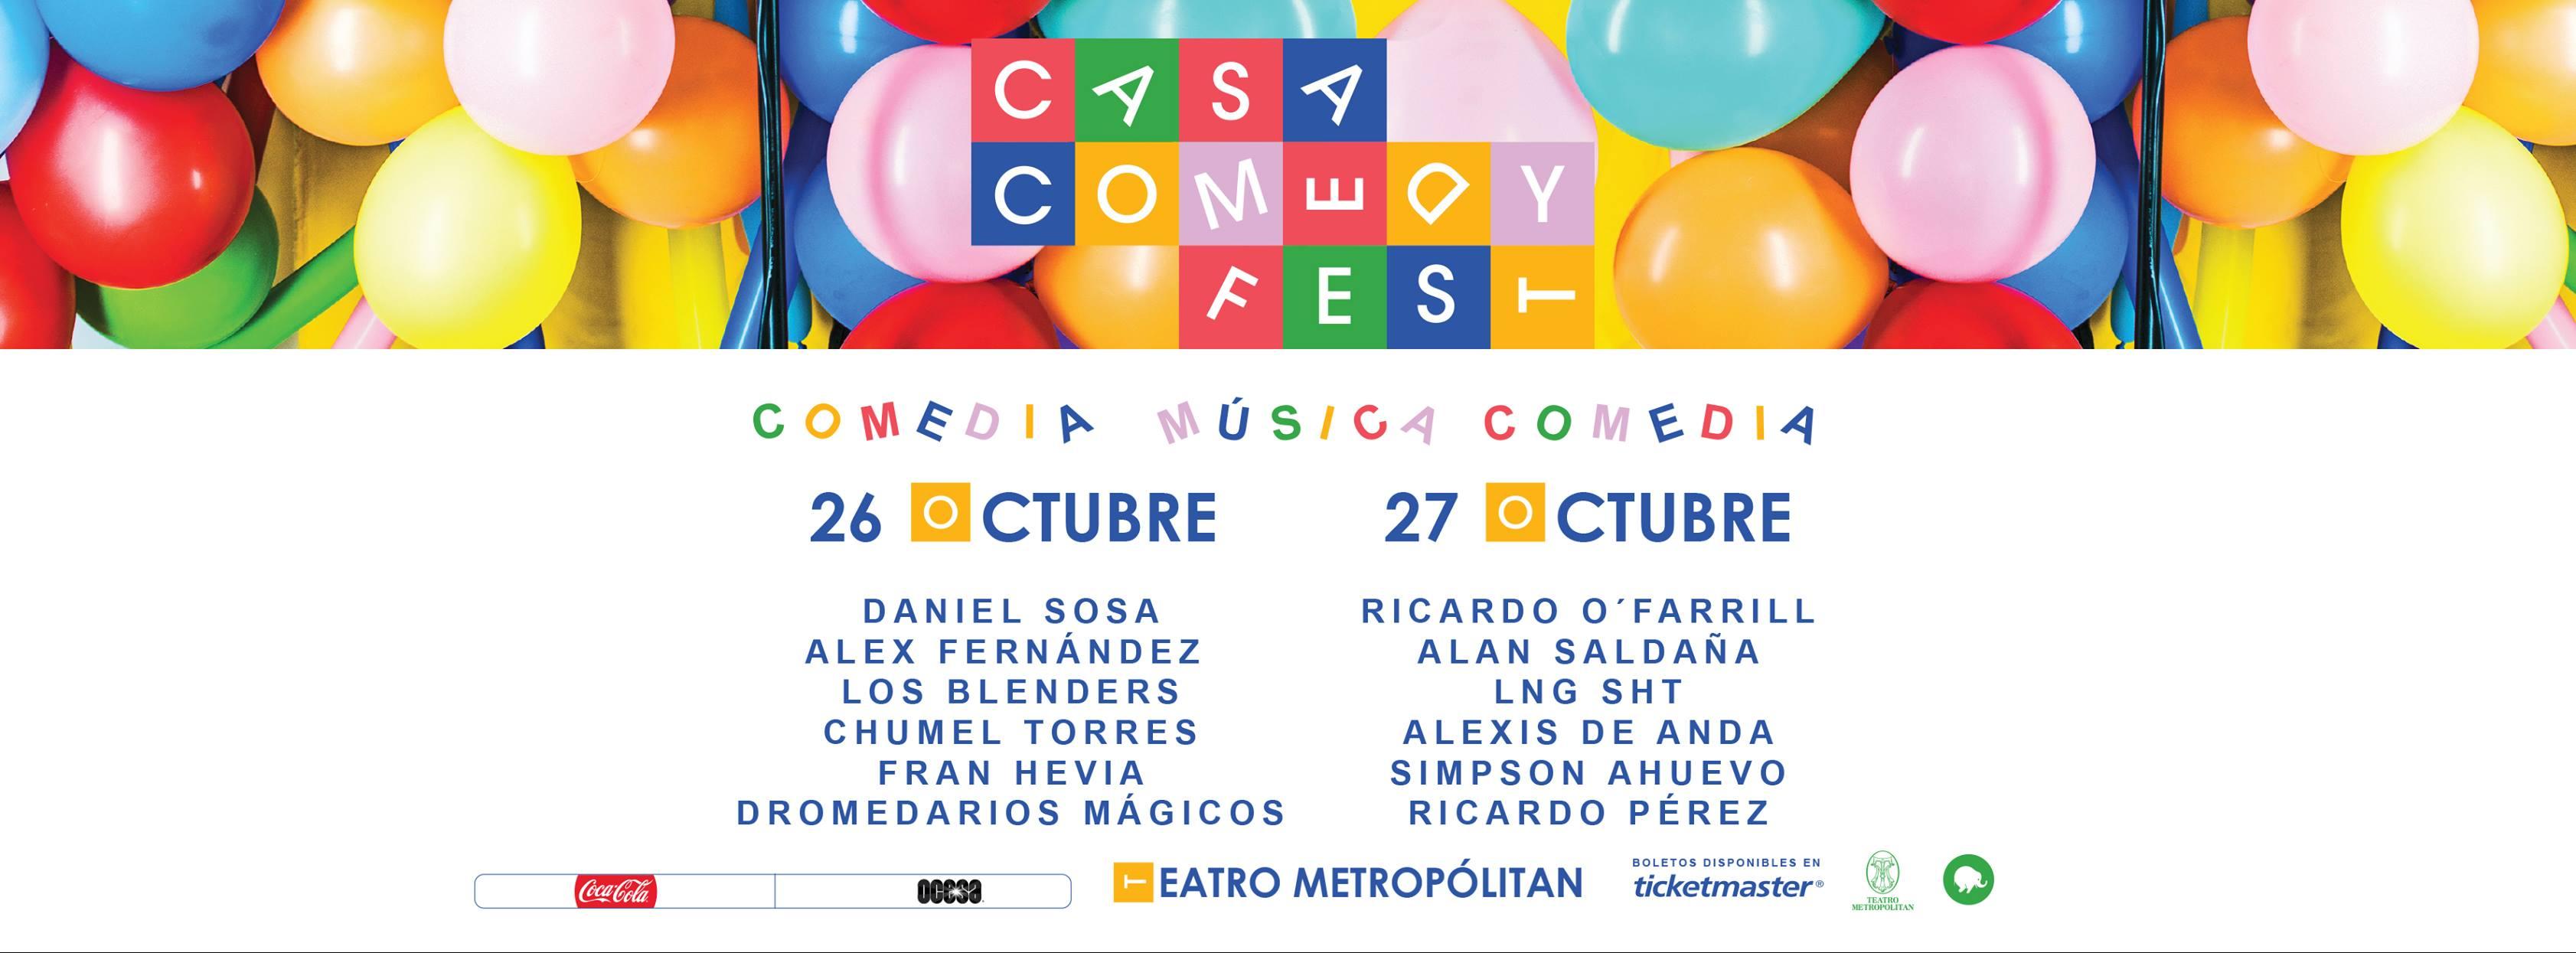 Casa Comedy Fest body